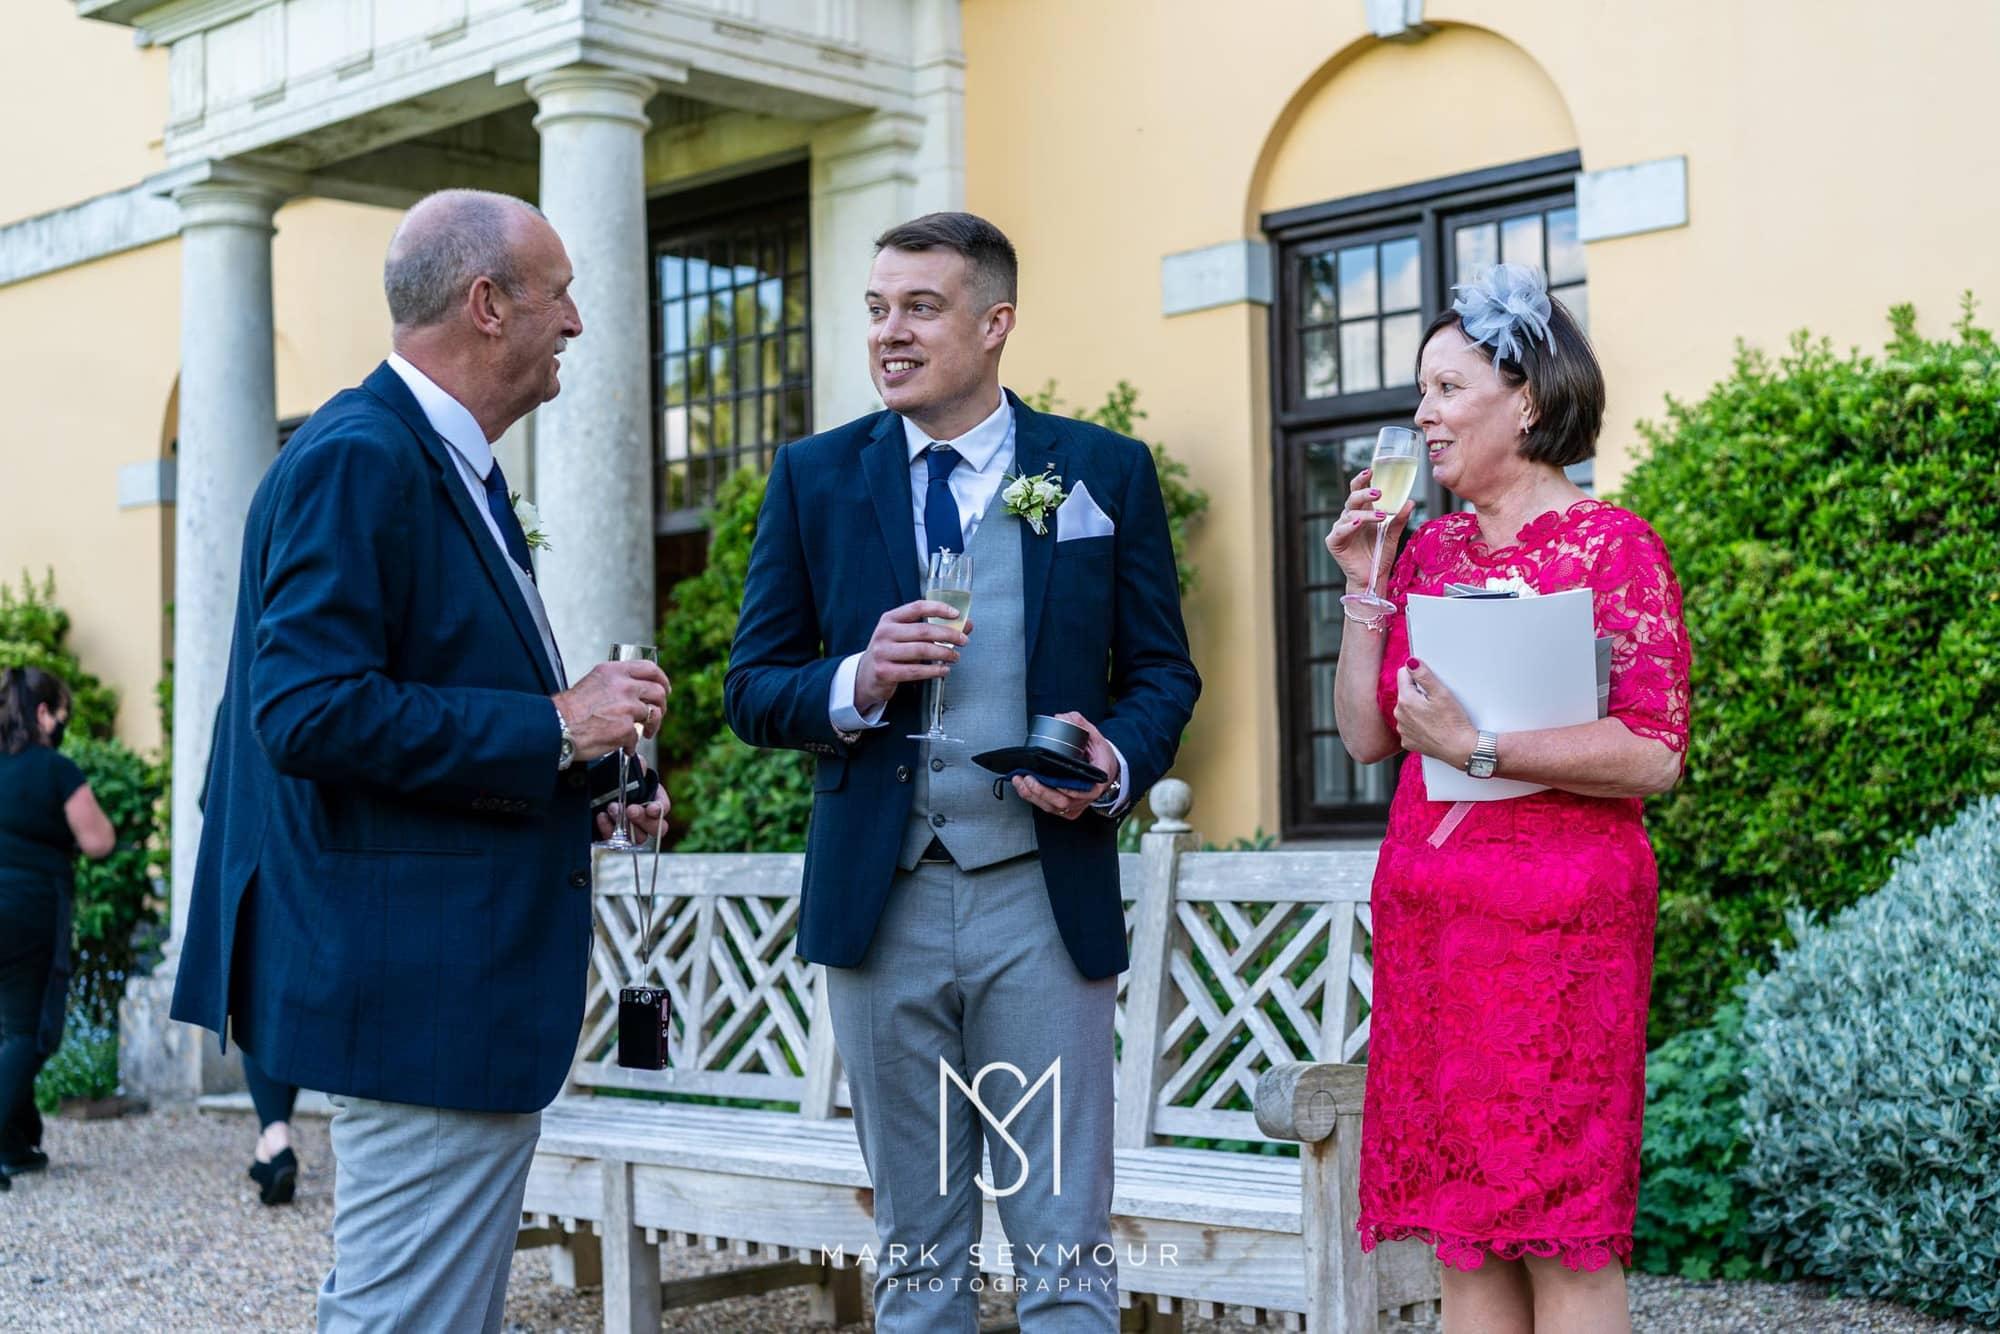 Hampden House Wedding Photography - Hannah and Lee's wedding. 13